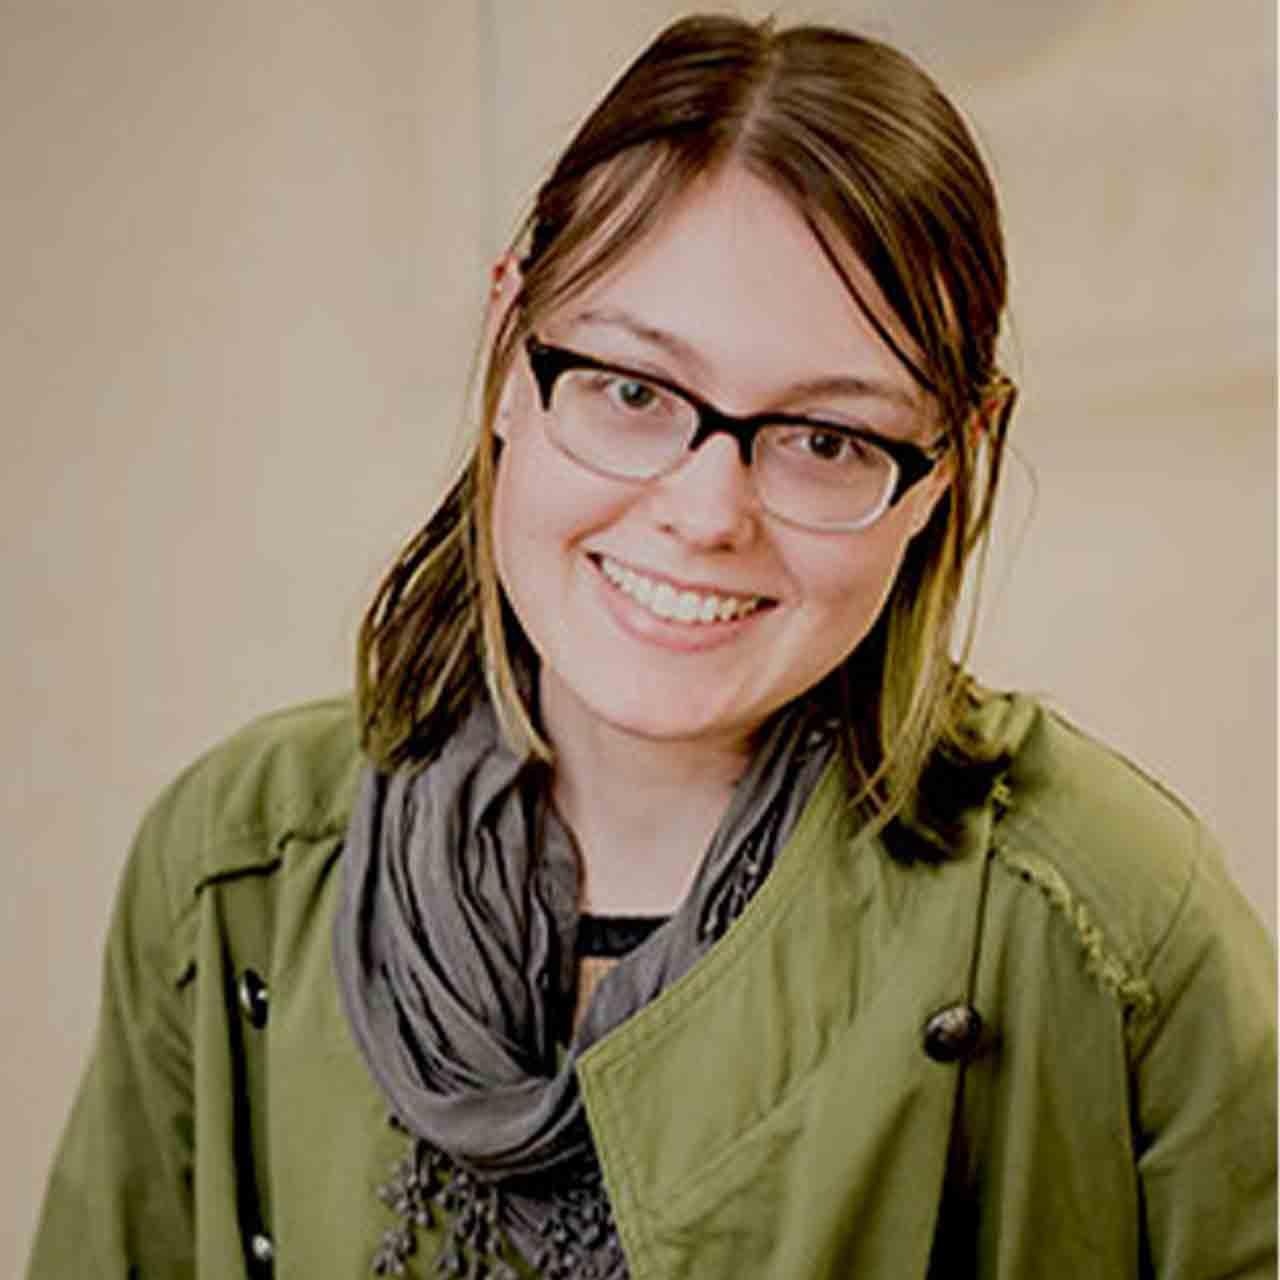 Katie McFalls